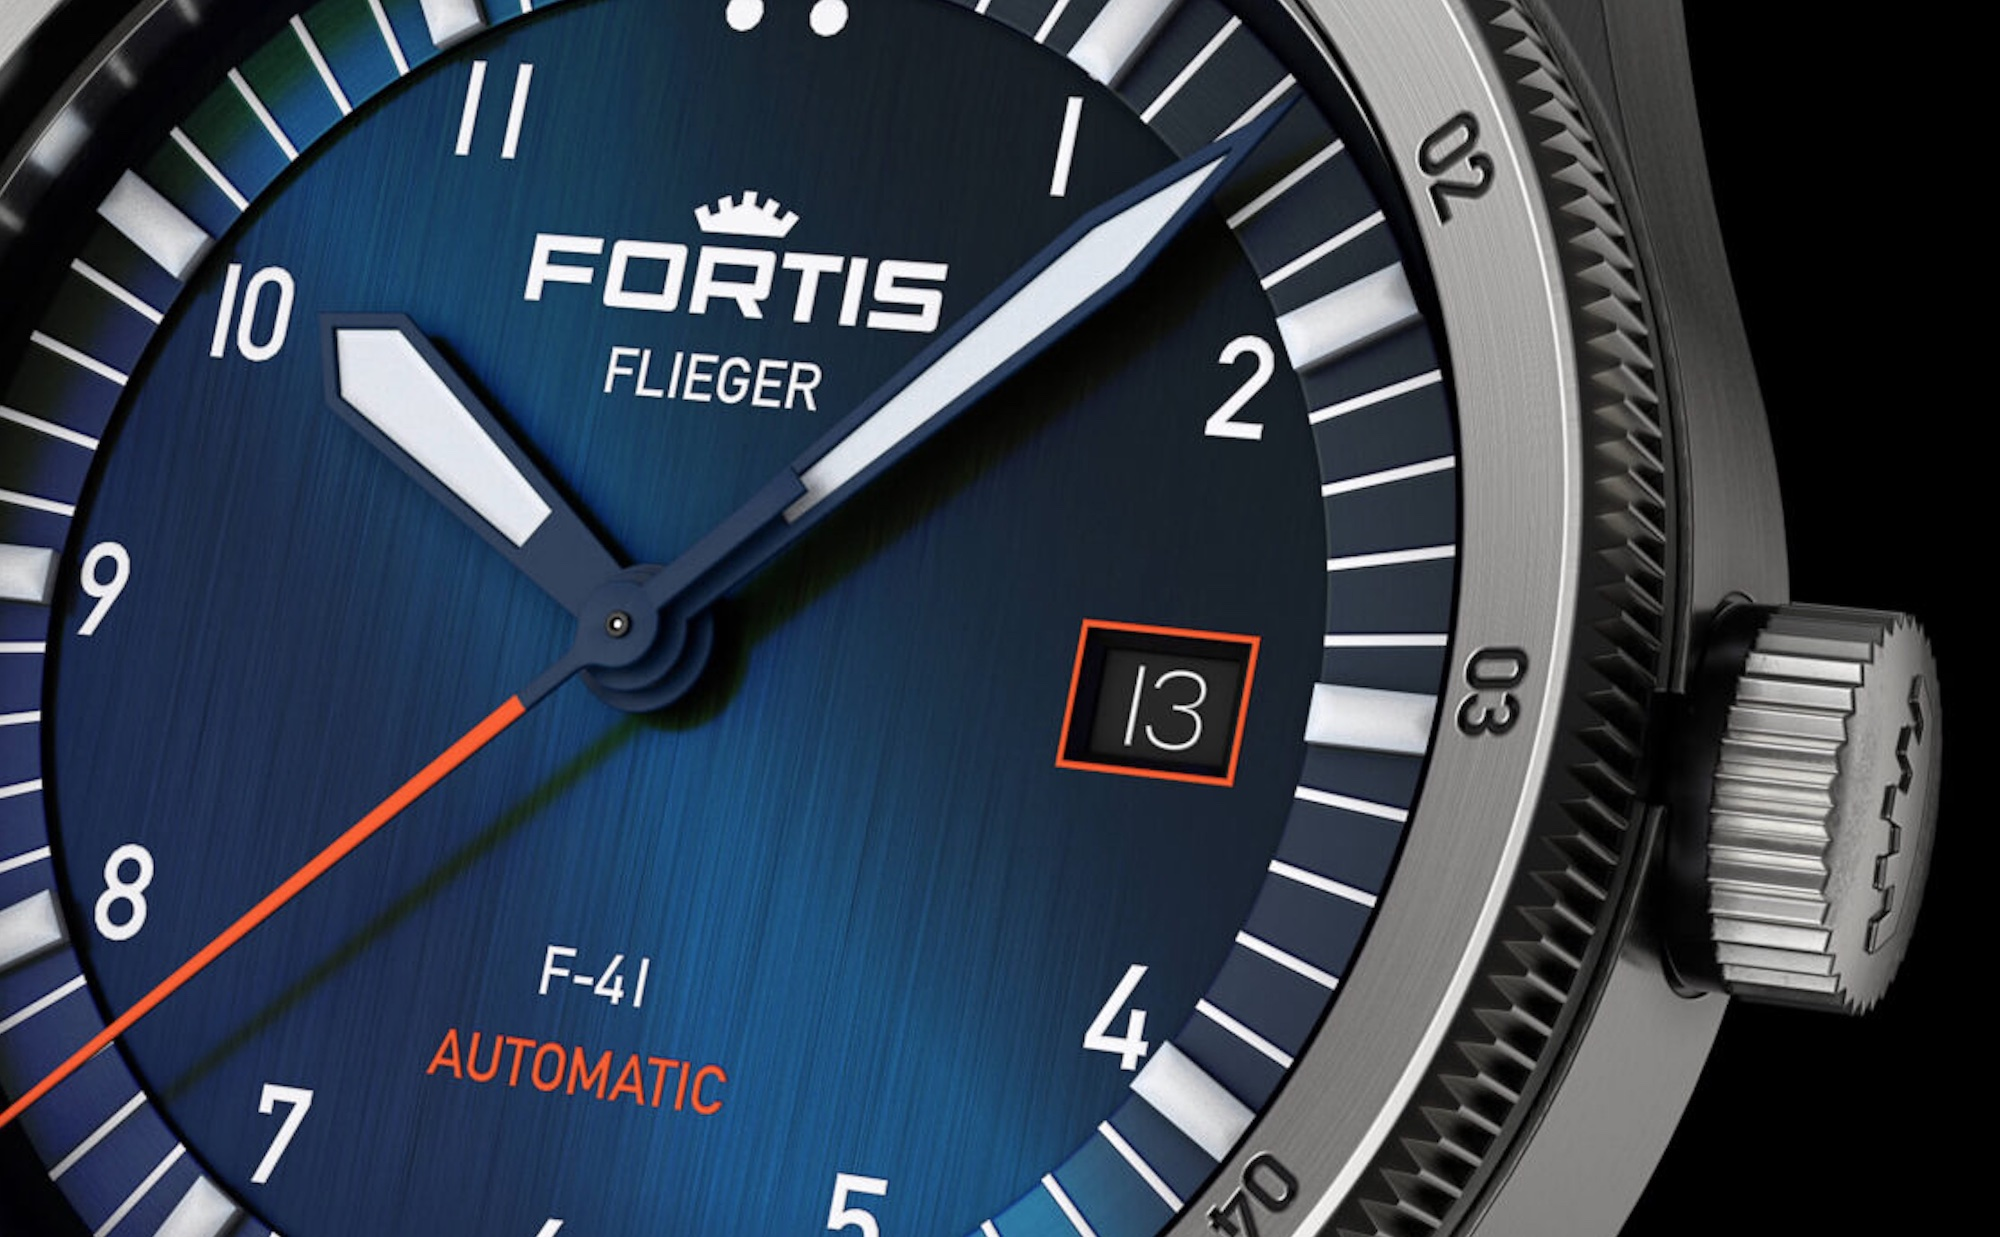 Fortis Flieger F-41 Midnight Blue F4220013 Detalle